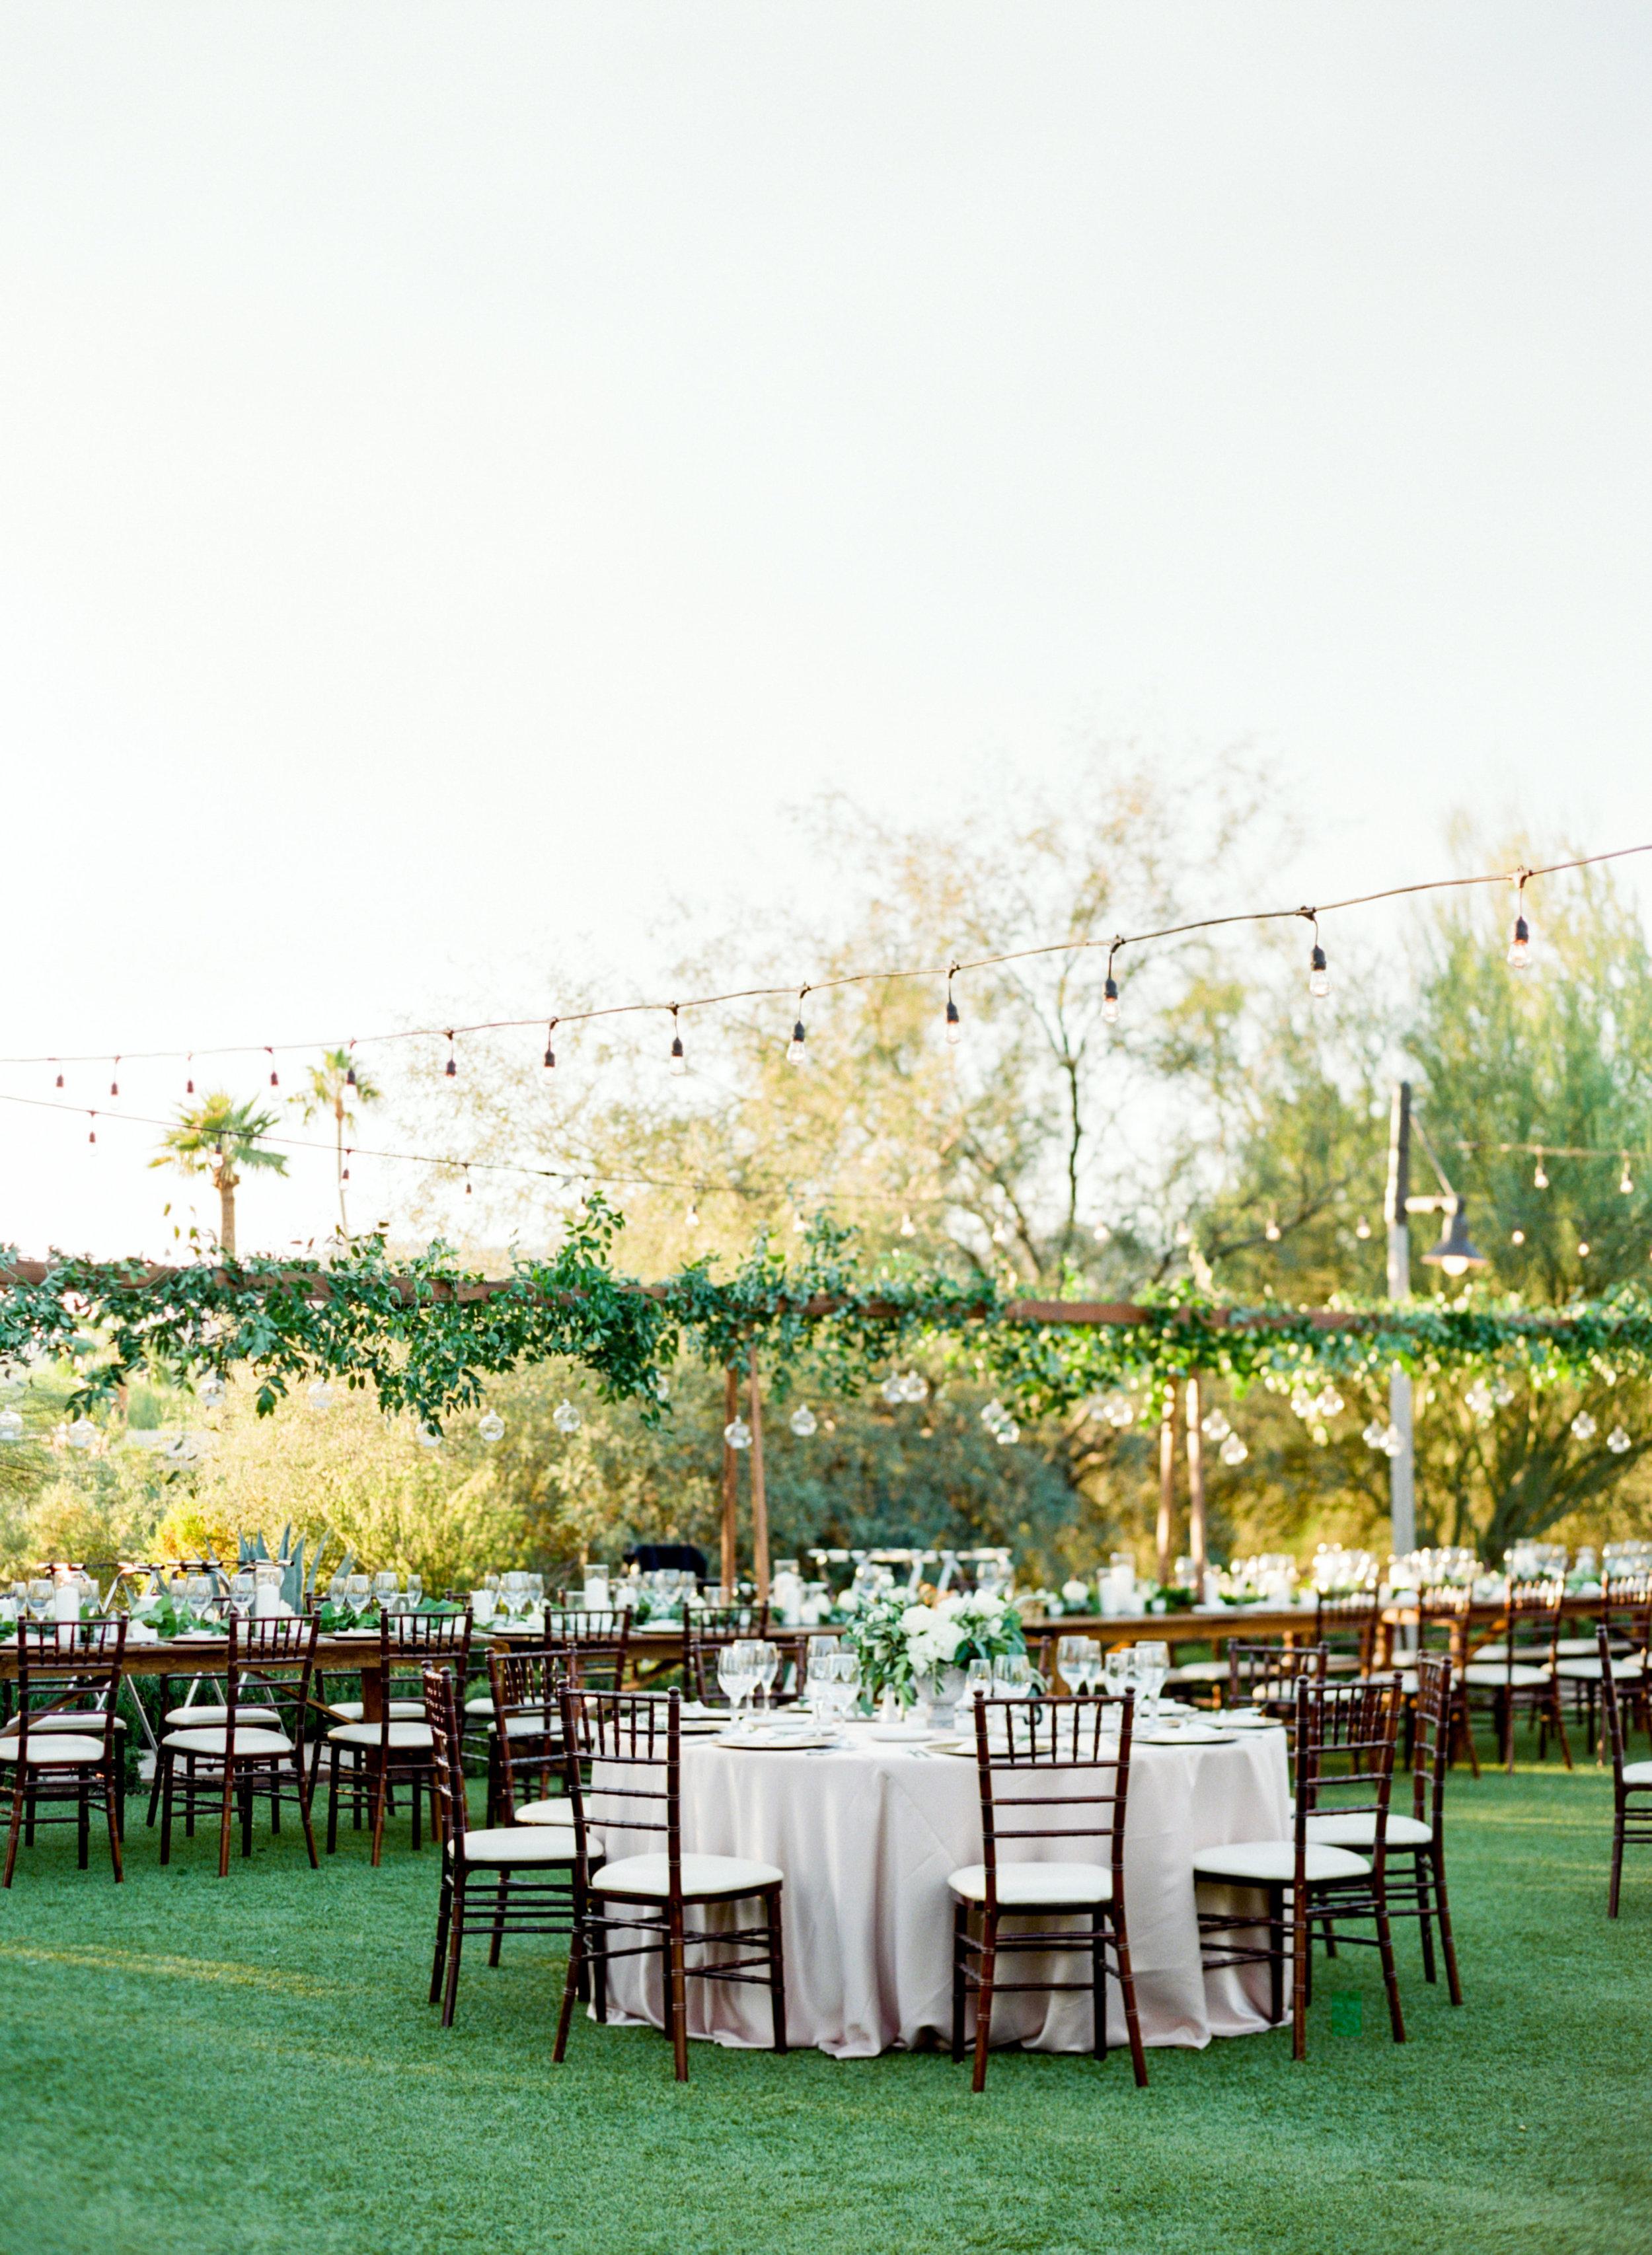 Nick and Erica Wedding at El Chorro-10.jpg